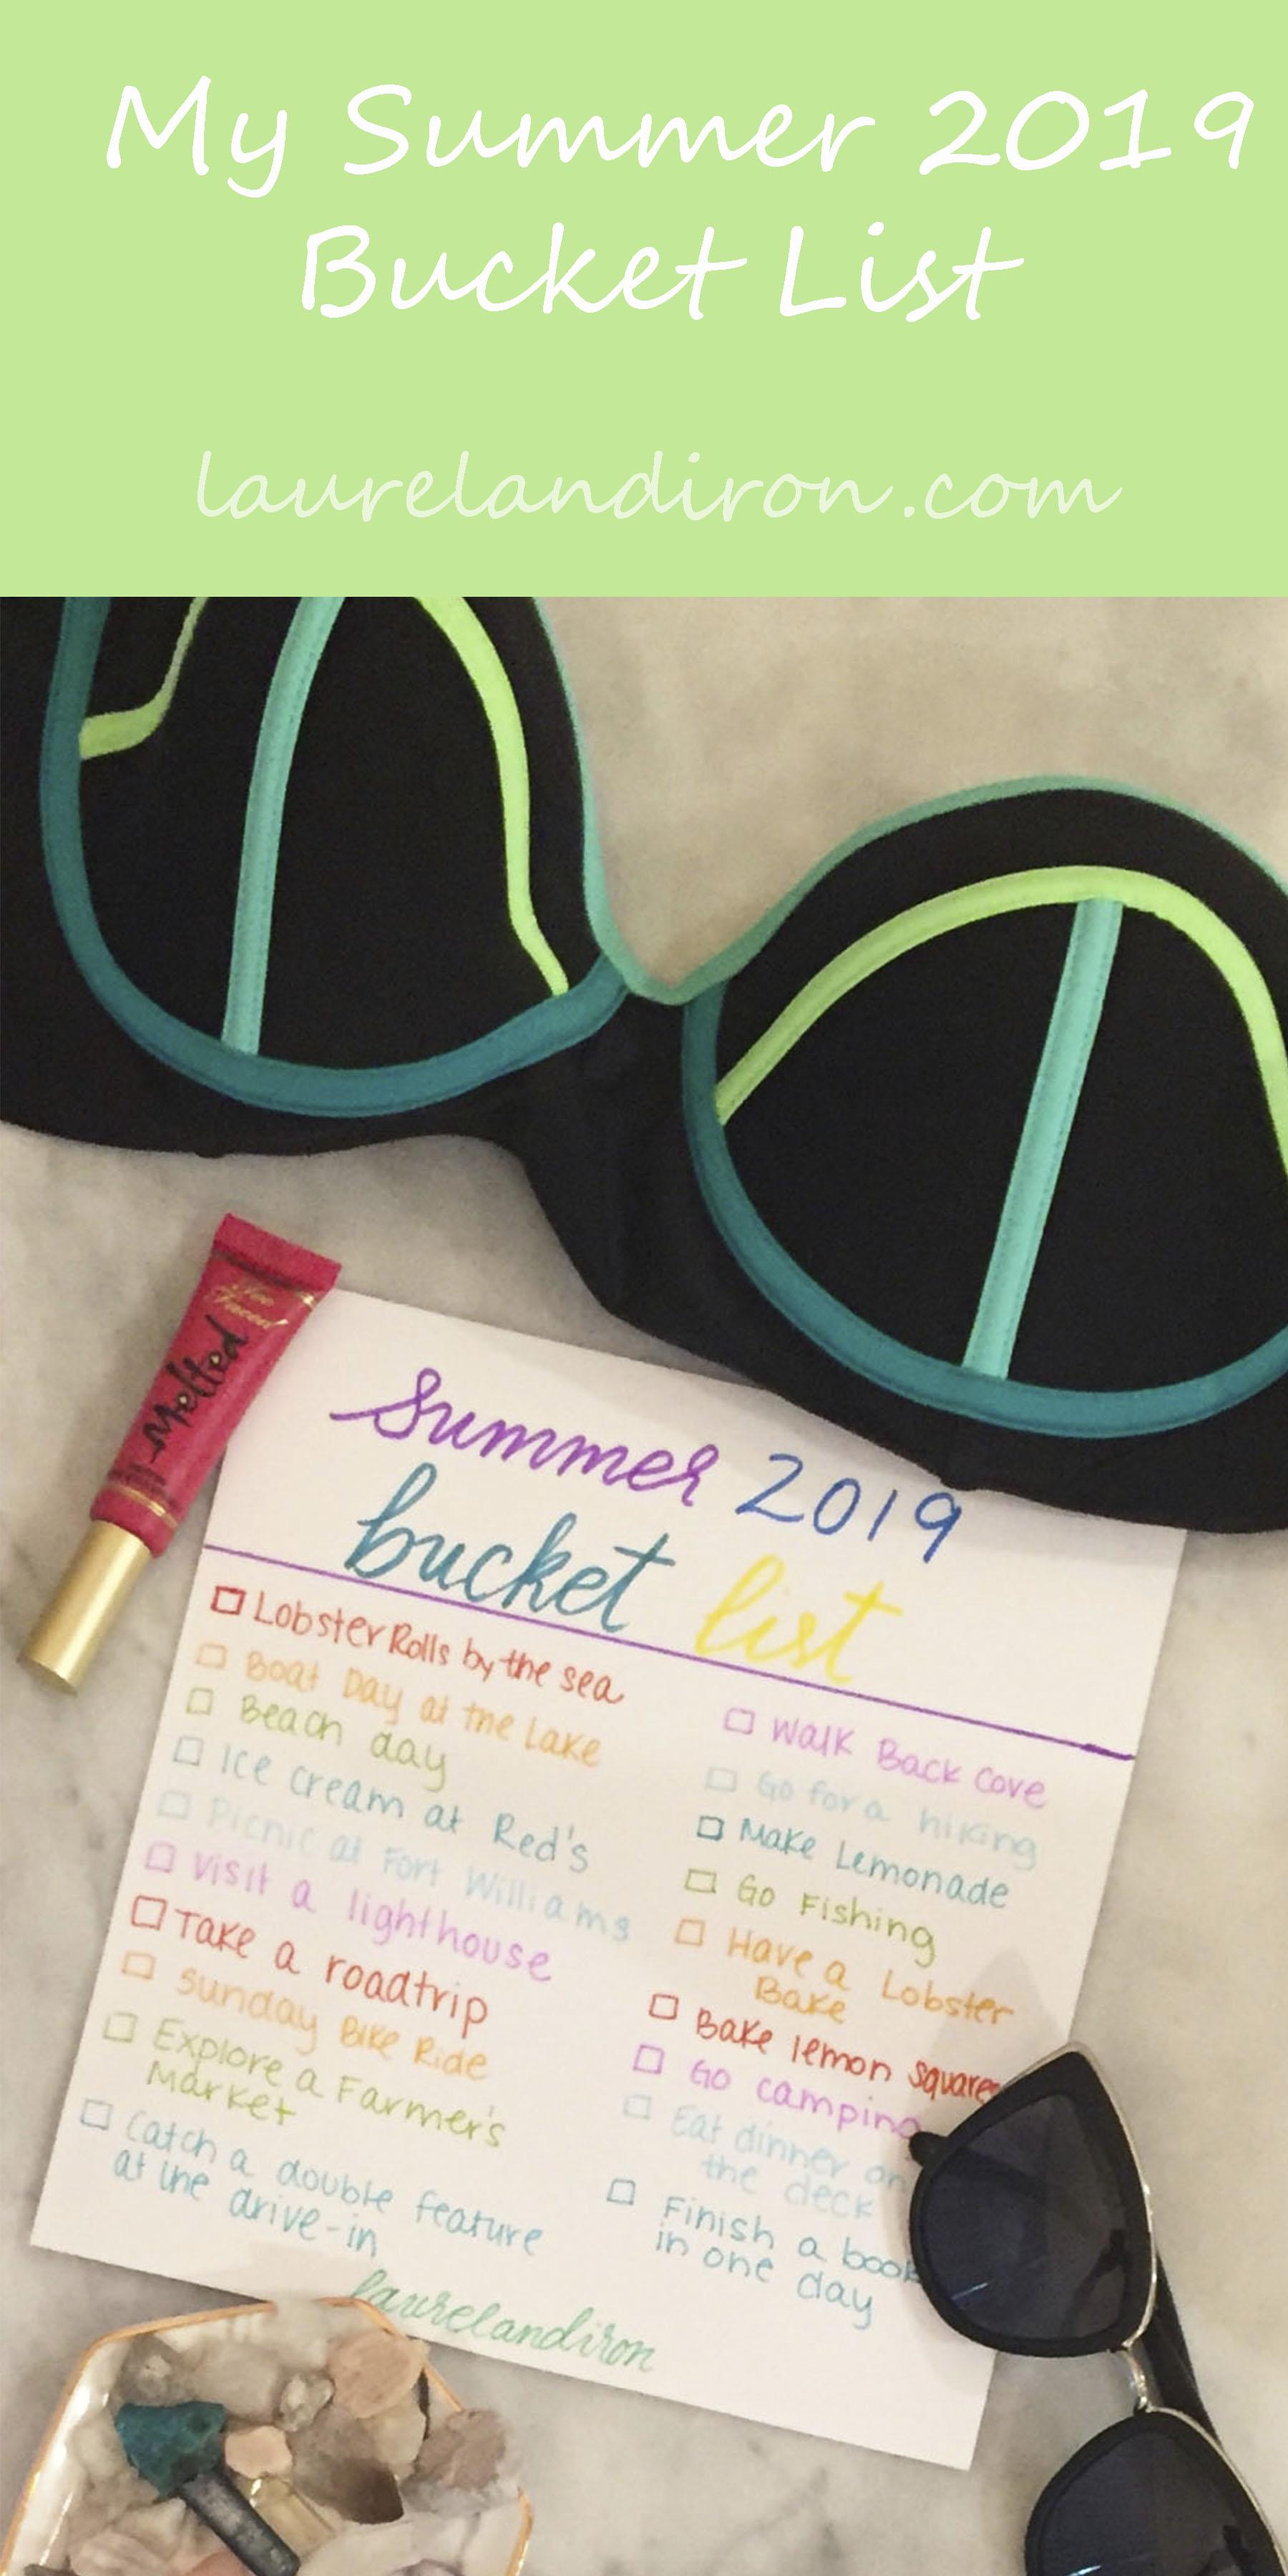 My Summer 2019 Bucket List | Laurel and Iron